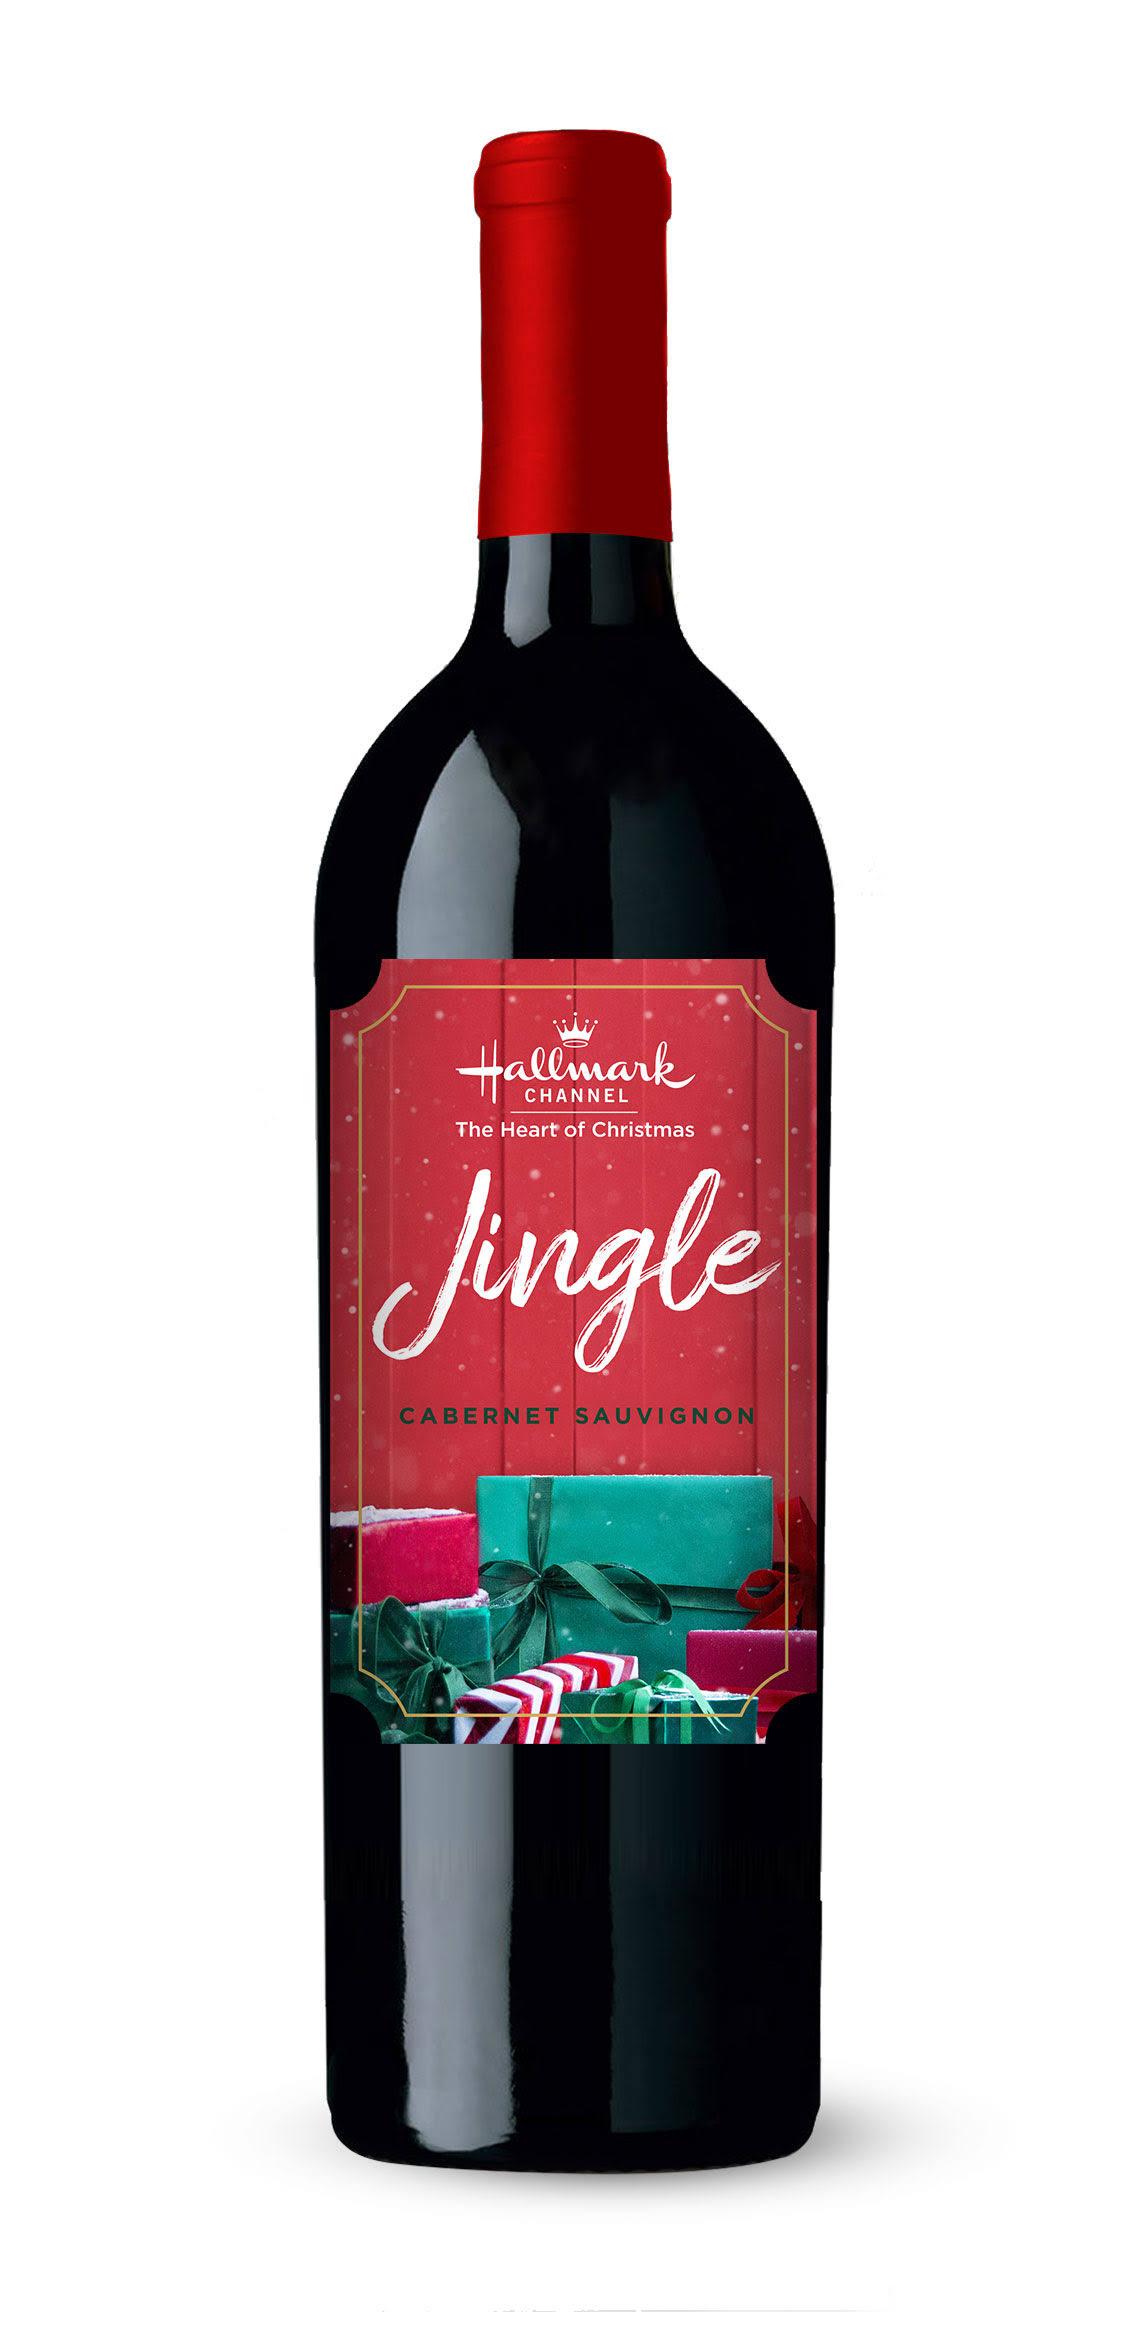 2018 Jingle Cabernet Sauvignon